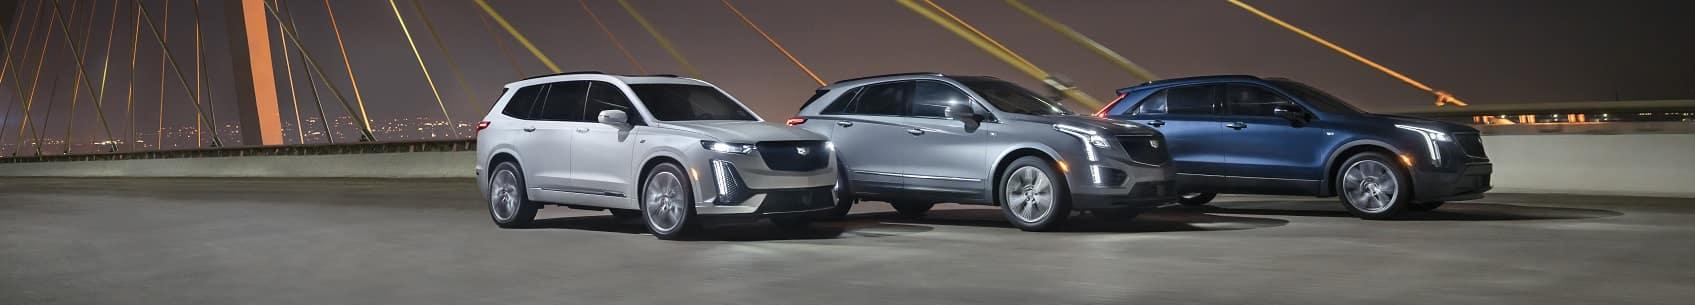 Cadillac SUVs for Sale